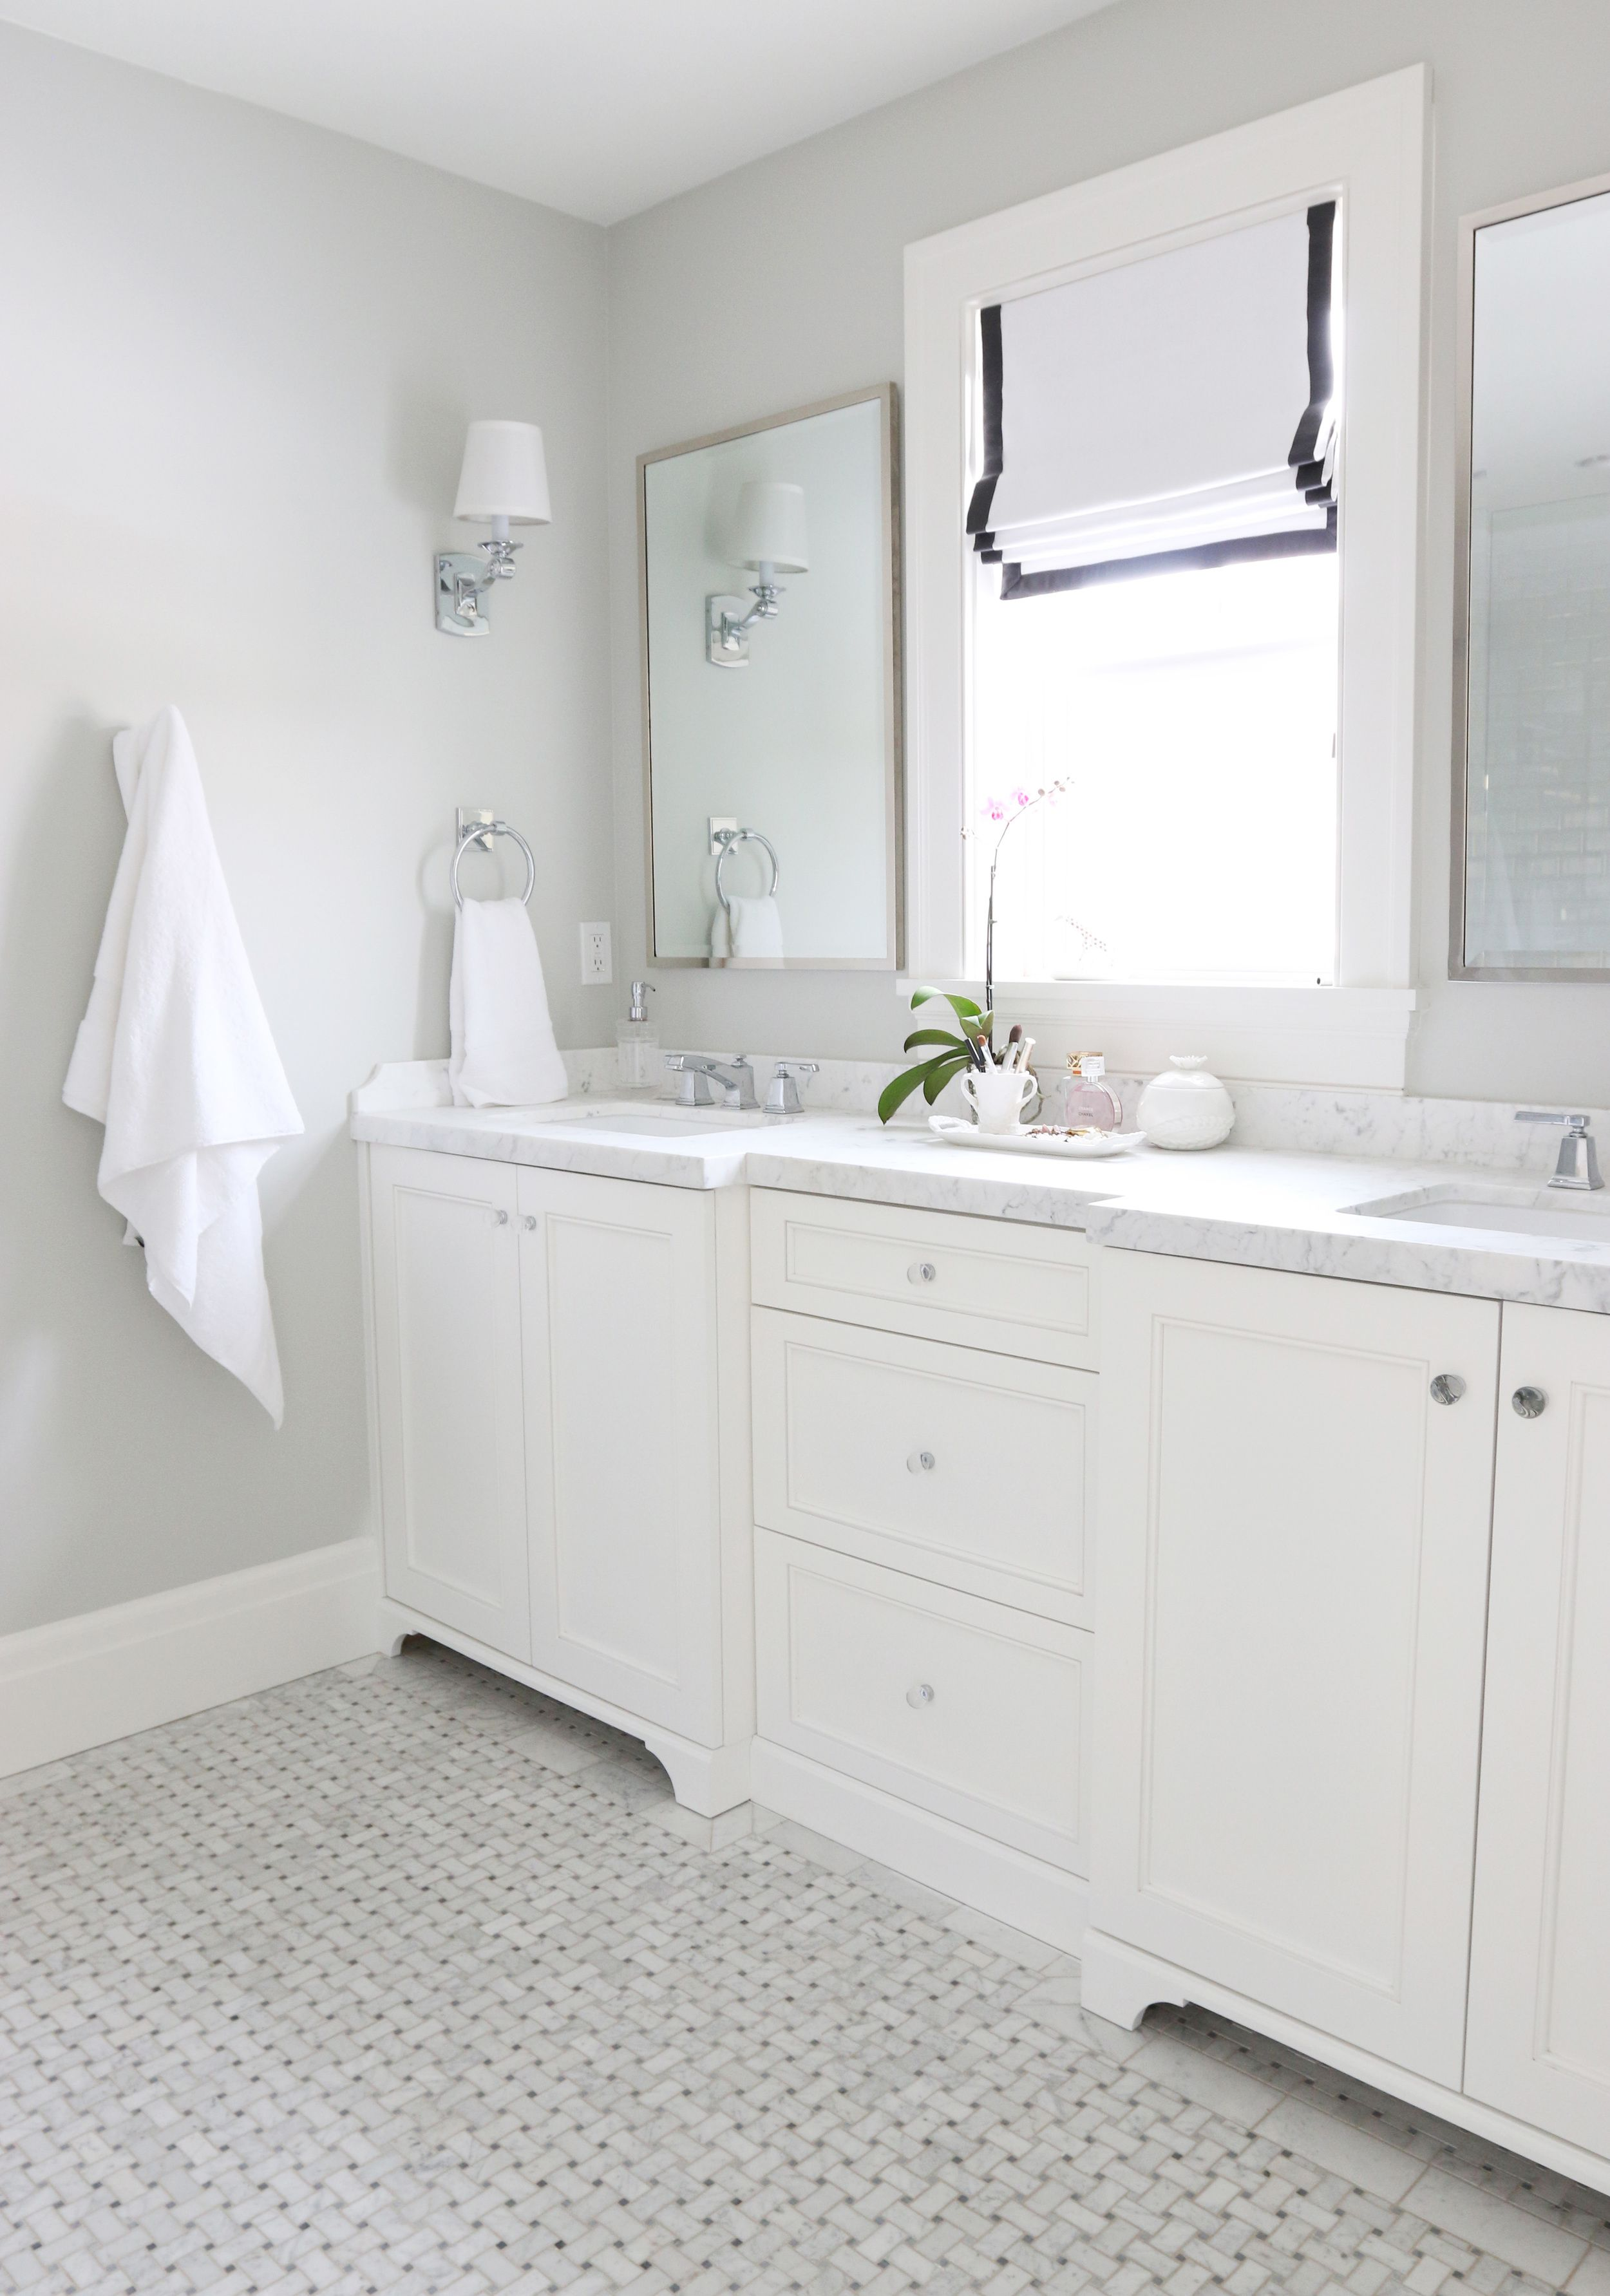 the midway house master bathroom girls rooms bathroom. Black Bedroom Furniture Sets. Home Design Ideas